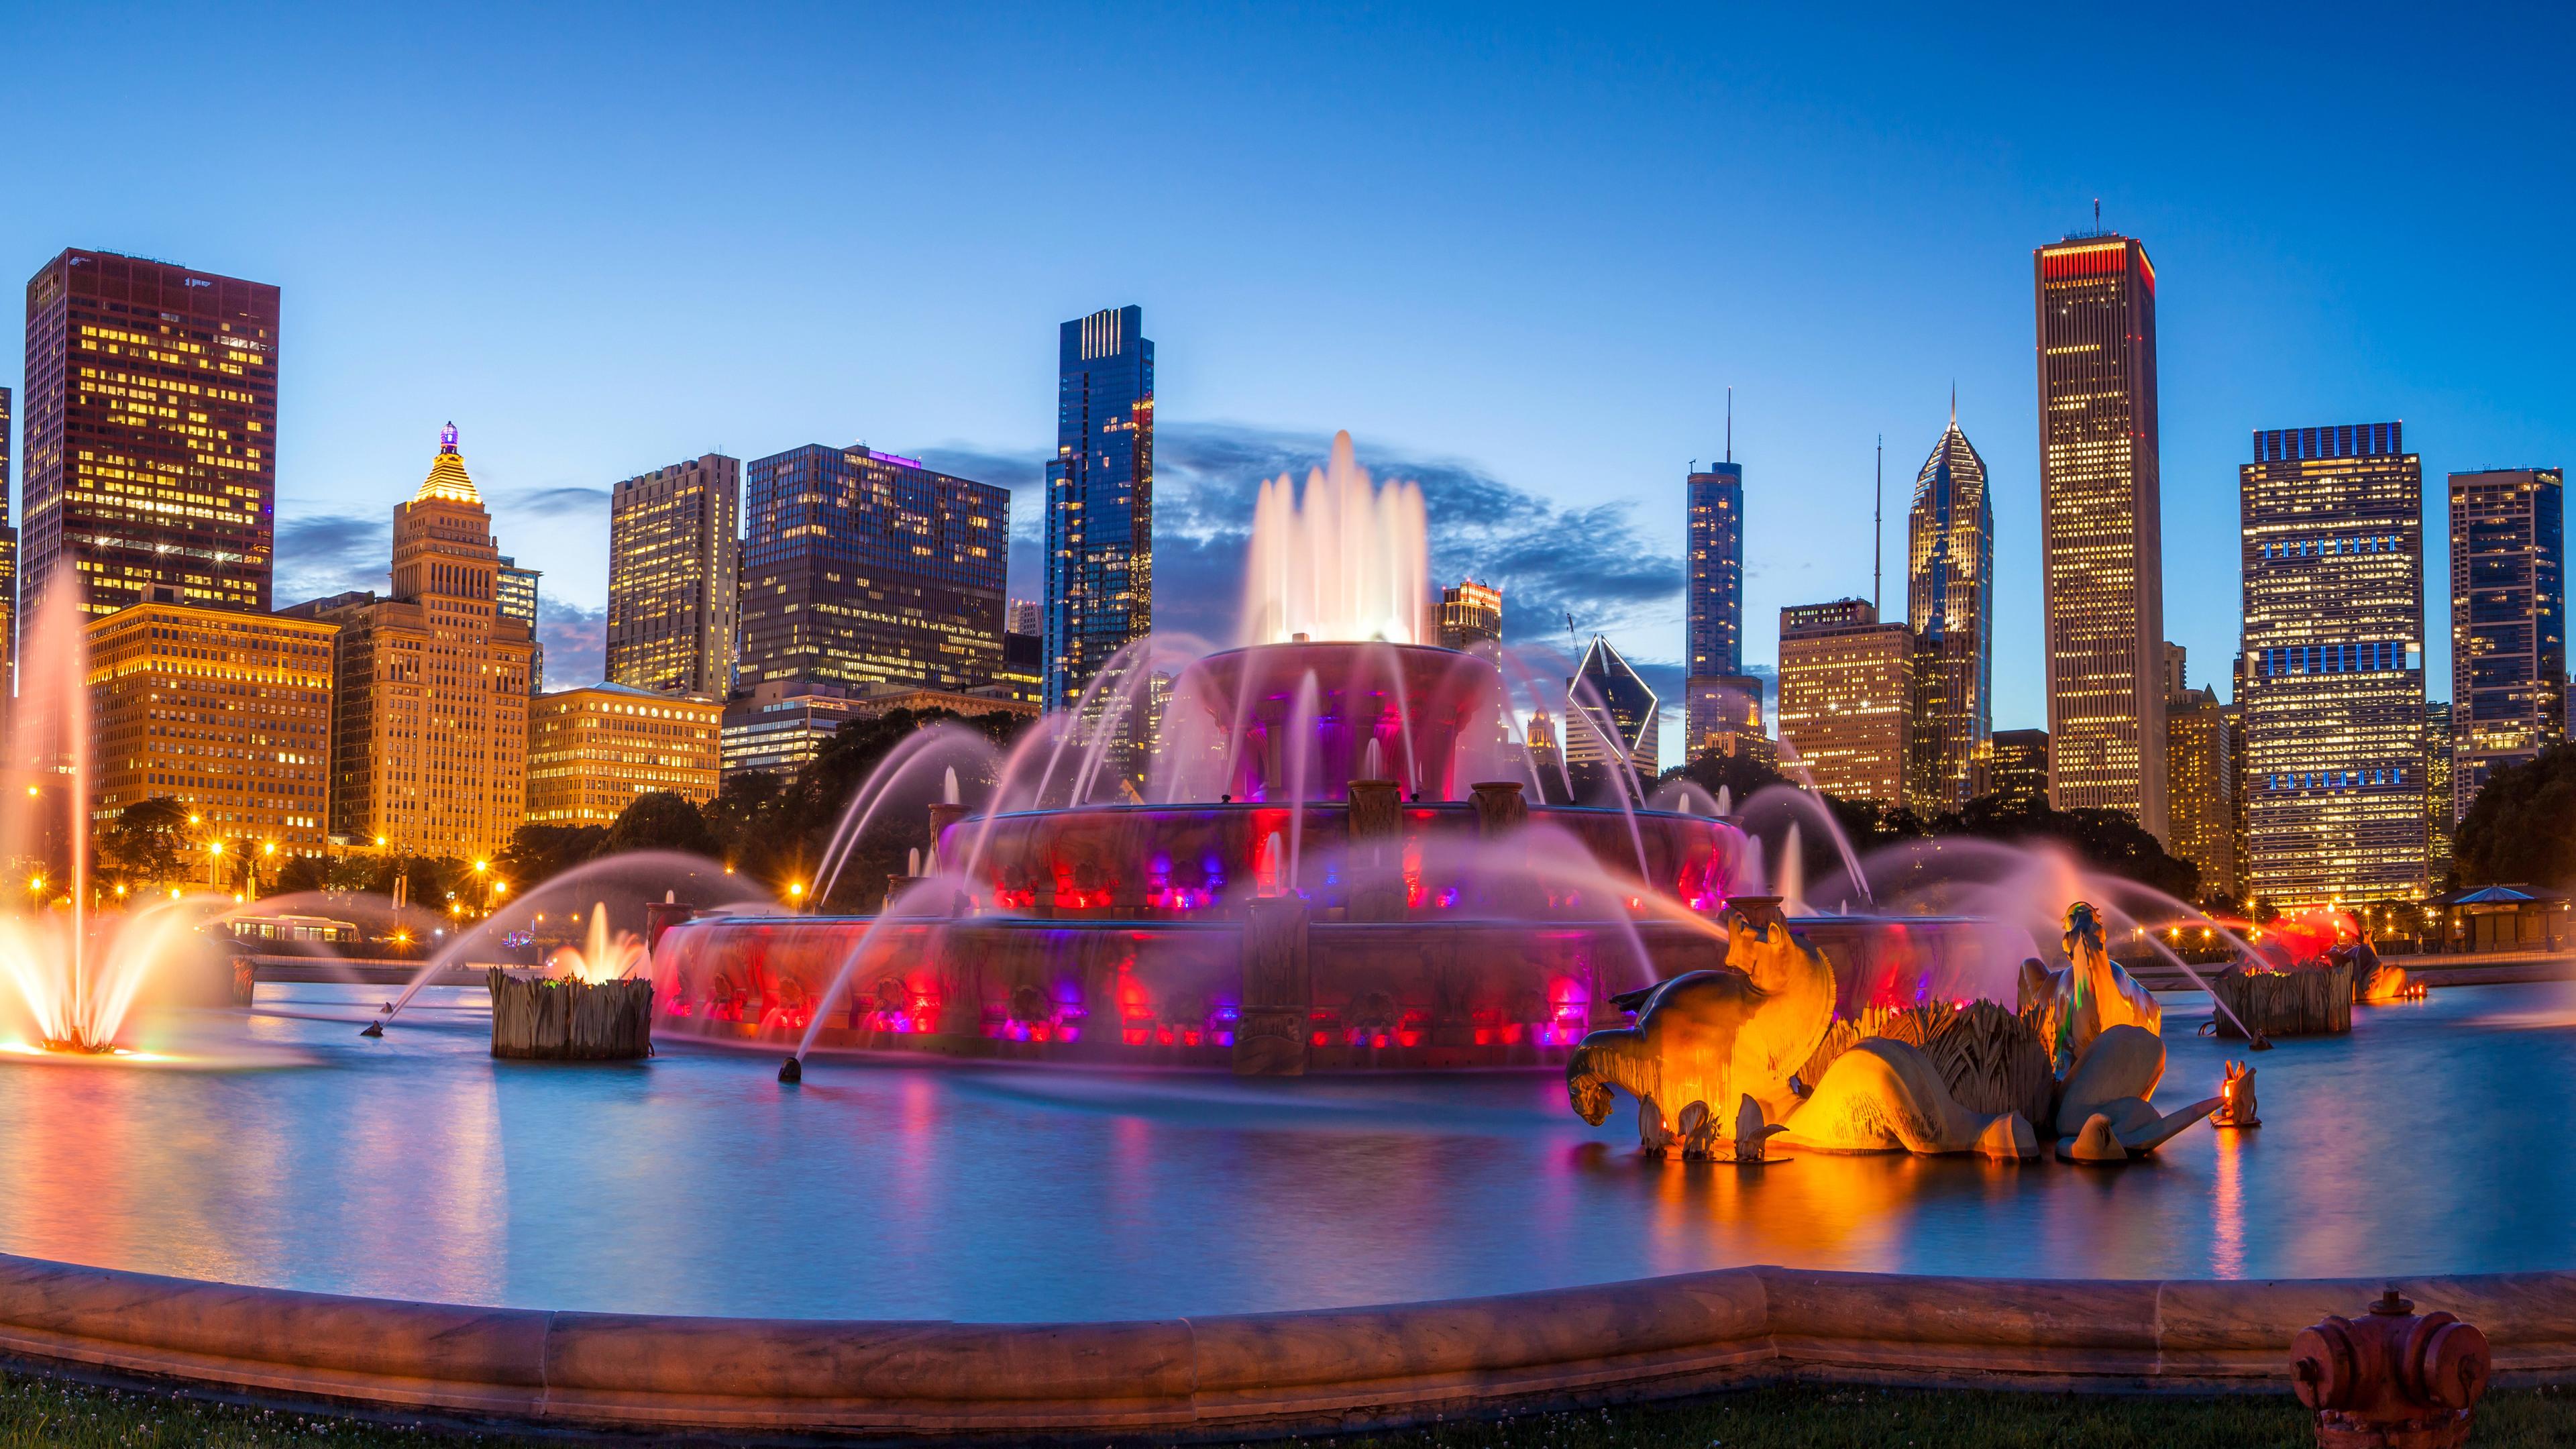 chicago city waterfall 8k 1538069340 - Chicago City Waterfall 8k - world wallpapers, waterfall wallpapers, lights wallpapers, hd-wallpapers, city wallpapers, 8k wallpapers, 5k wallpapers, 4k-wallpapers